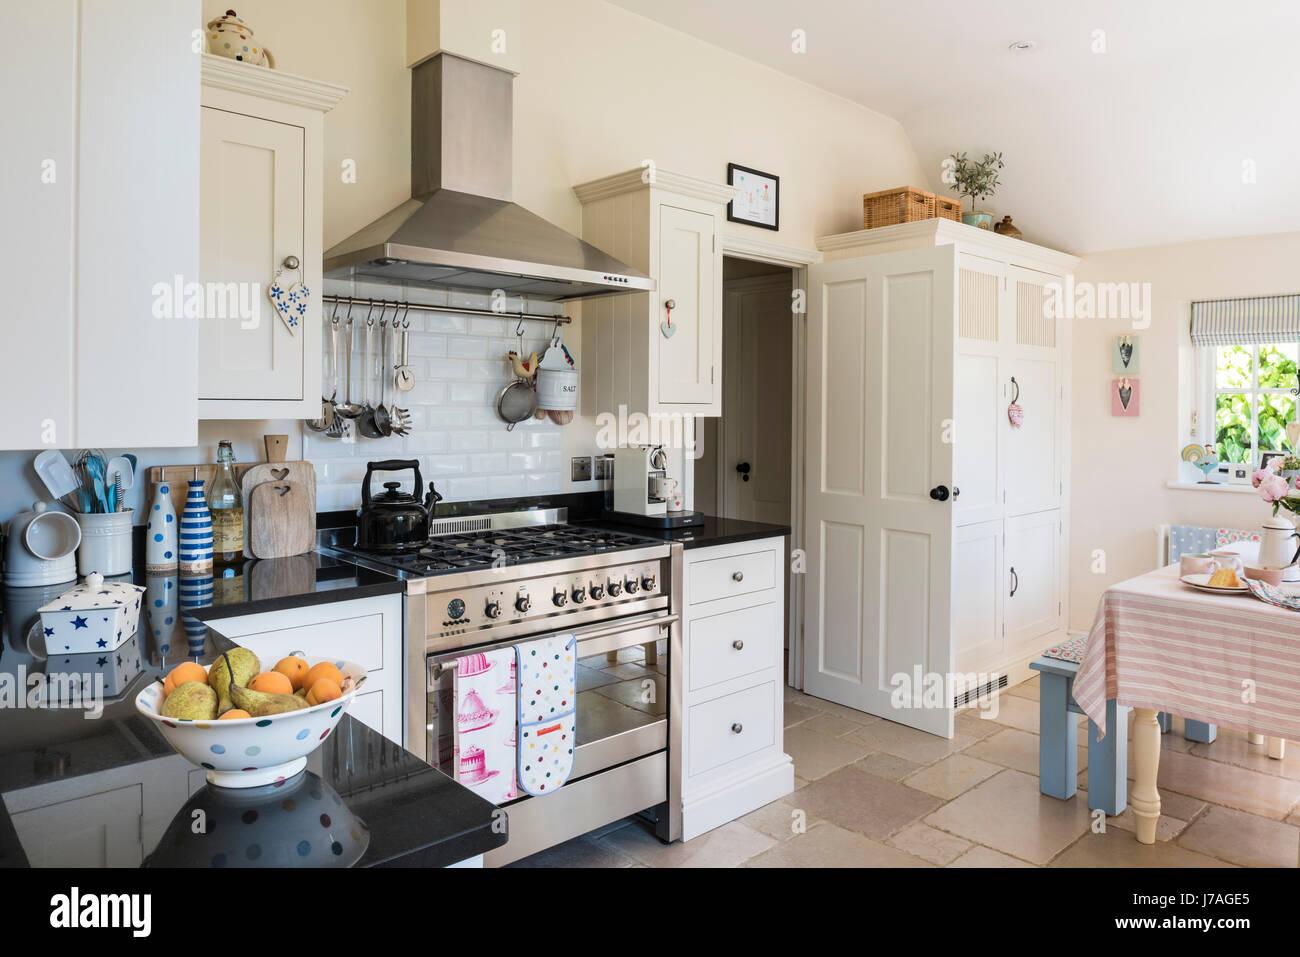 Spaziosa cucina a pianta aperta con smeg termocucina e rustico